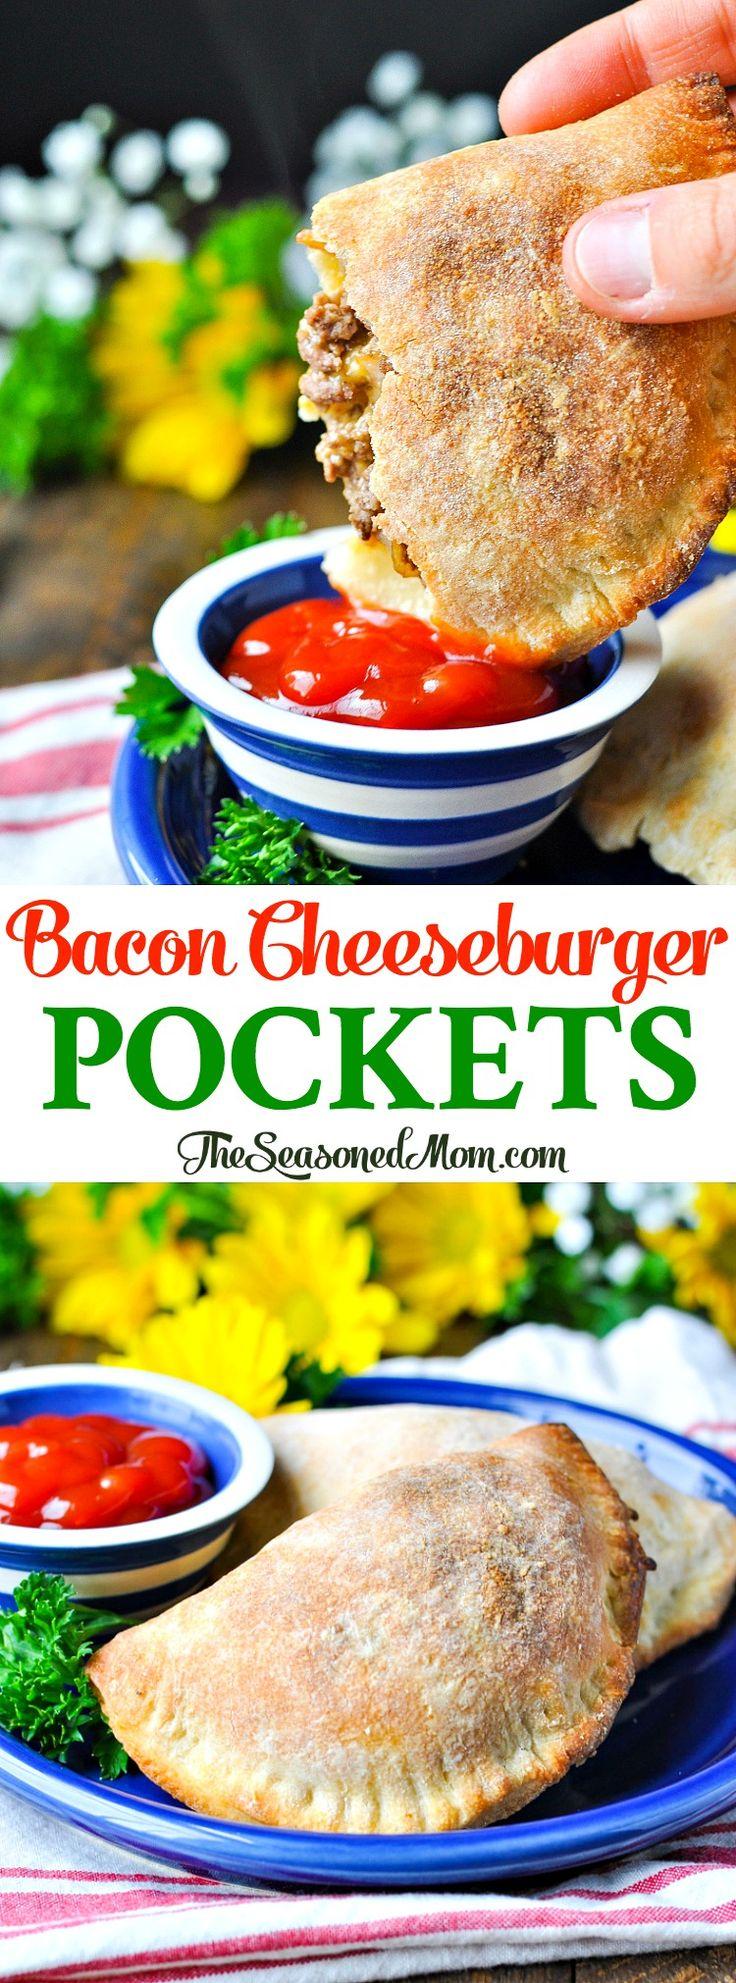 Bacon Cheeseburger Pockets